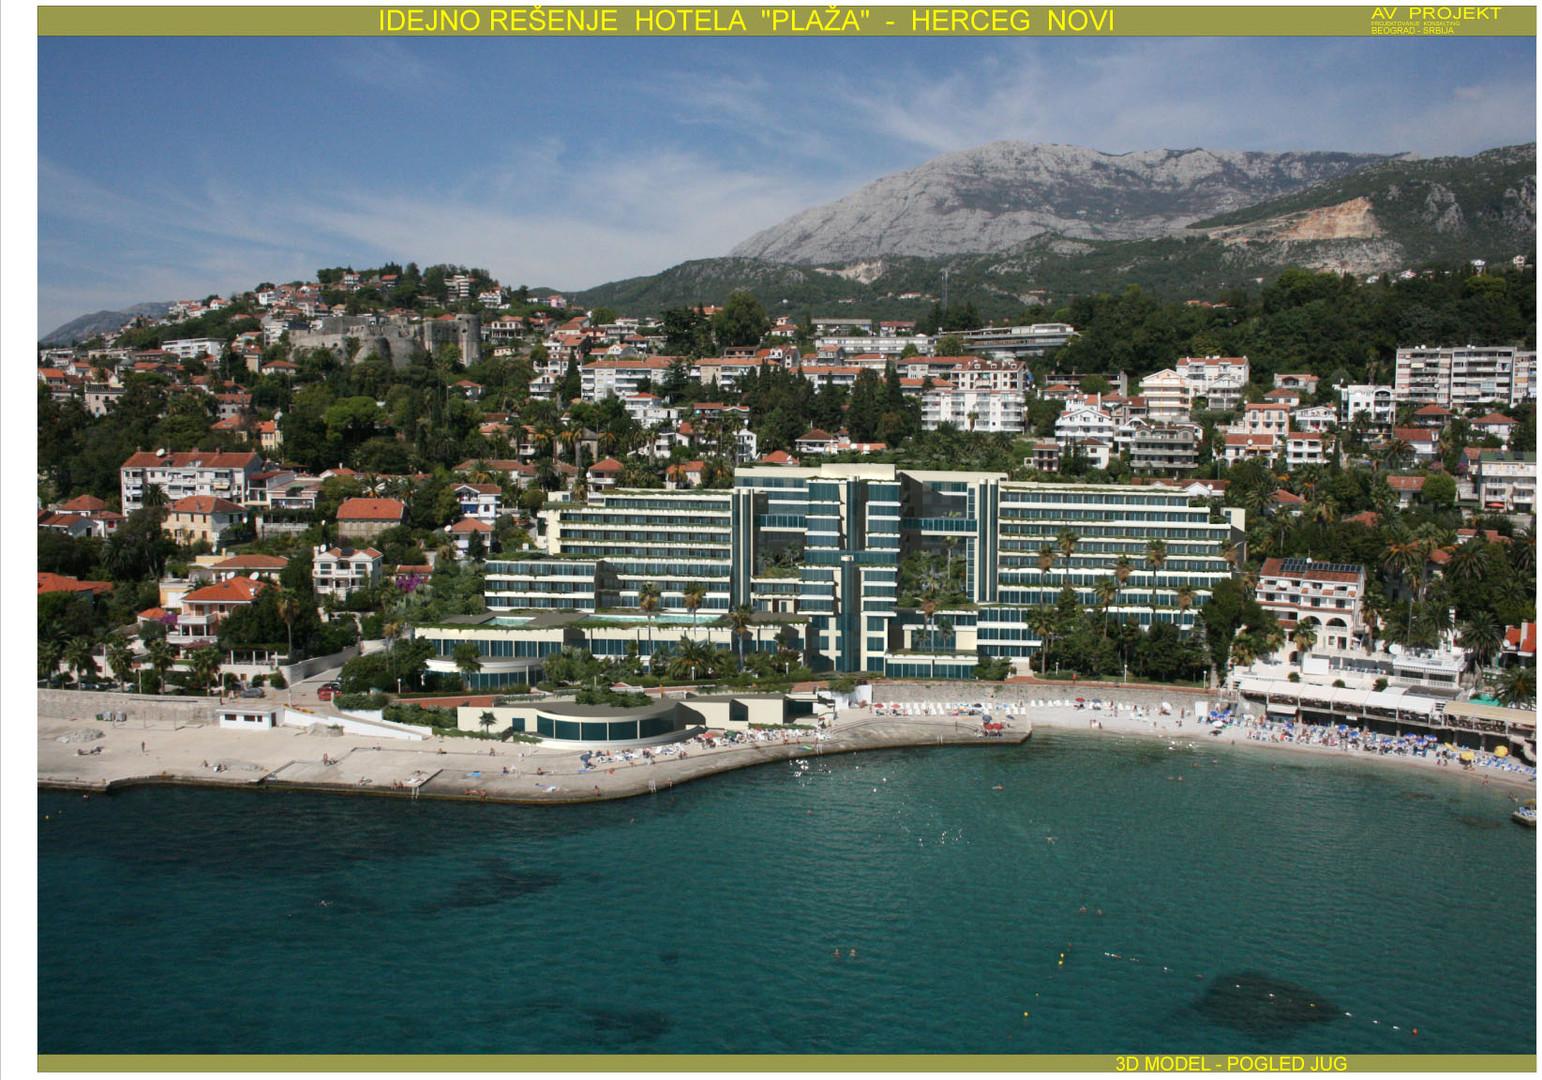 Hotel Plaza future plan